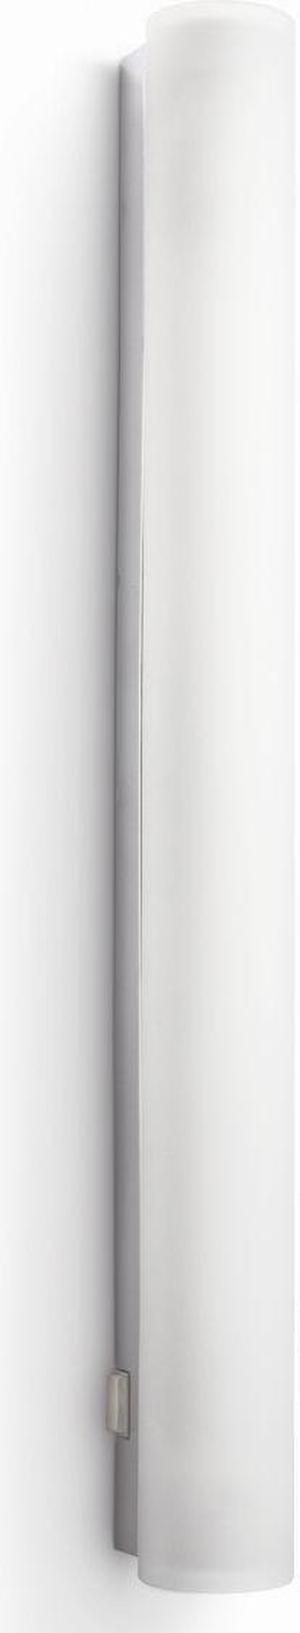 Vitalise svietidlo nástenné G9 4,5W IP44 biela